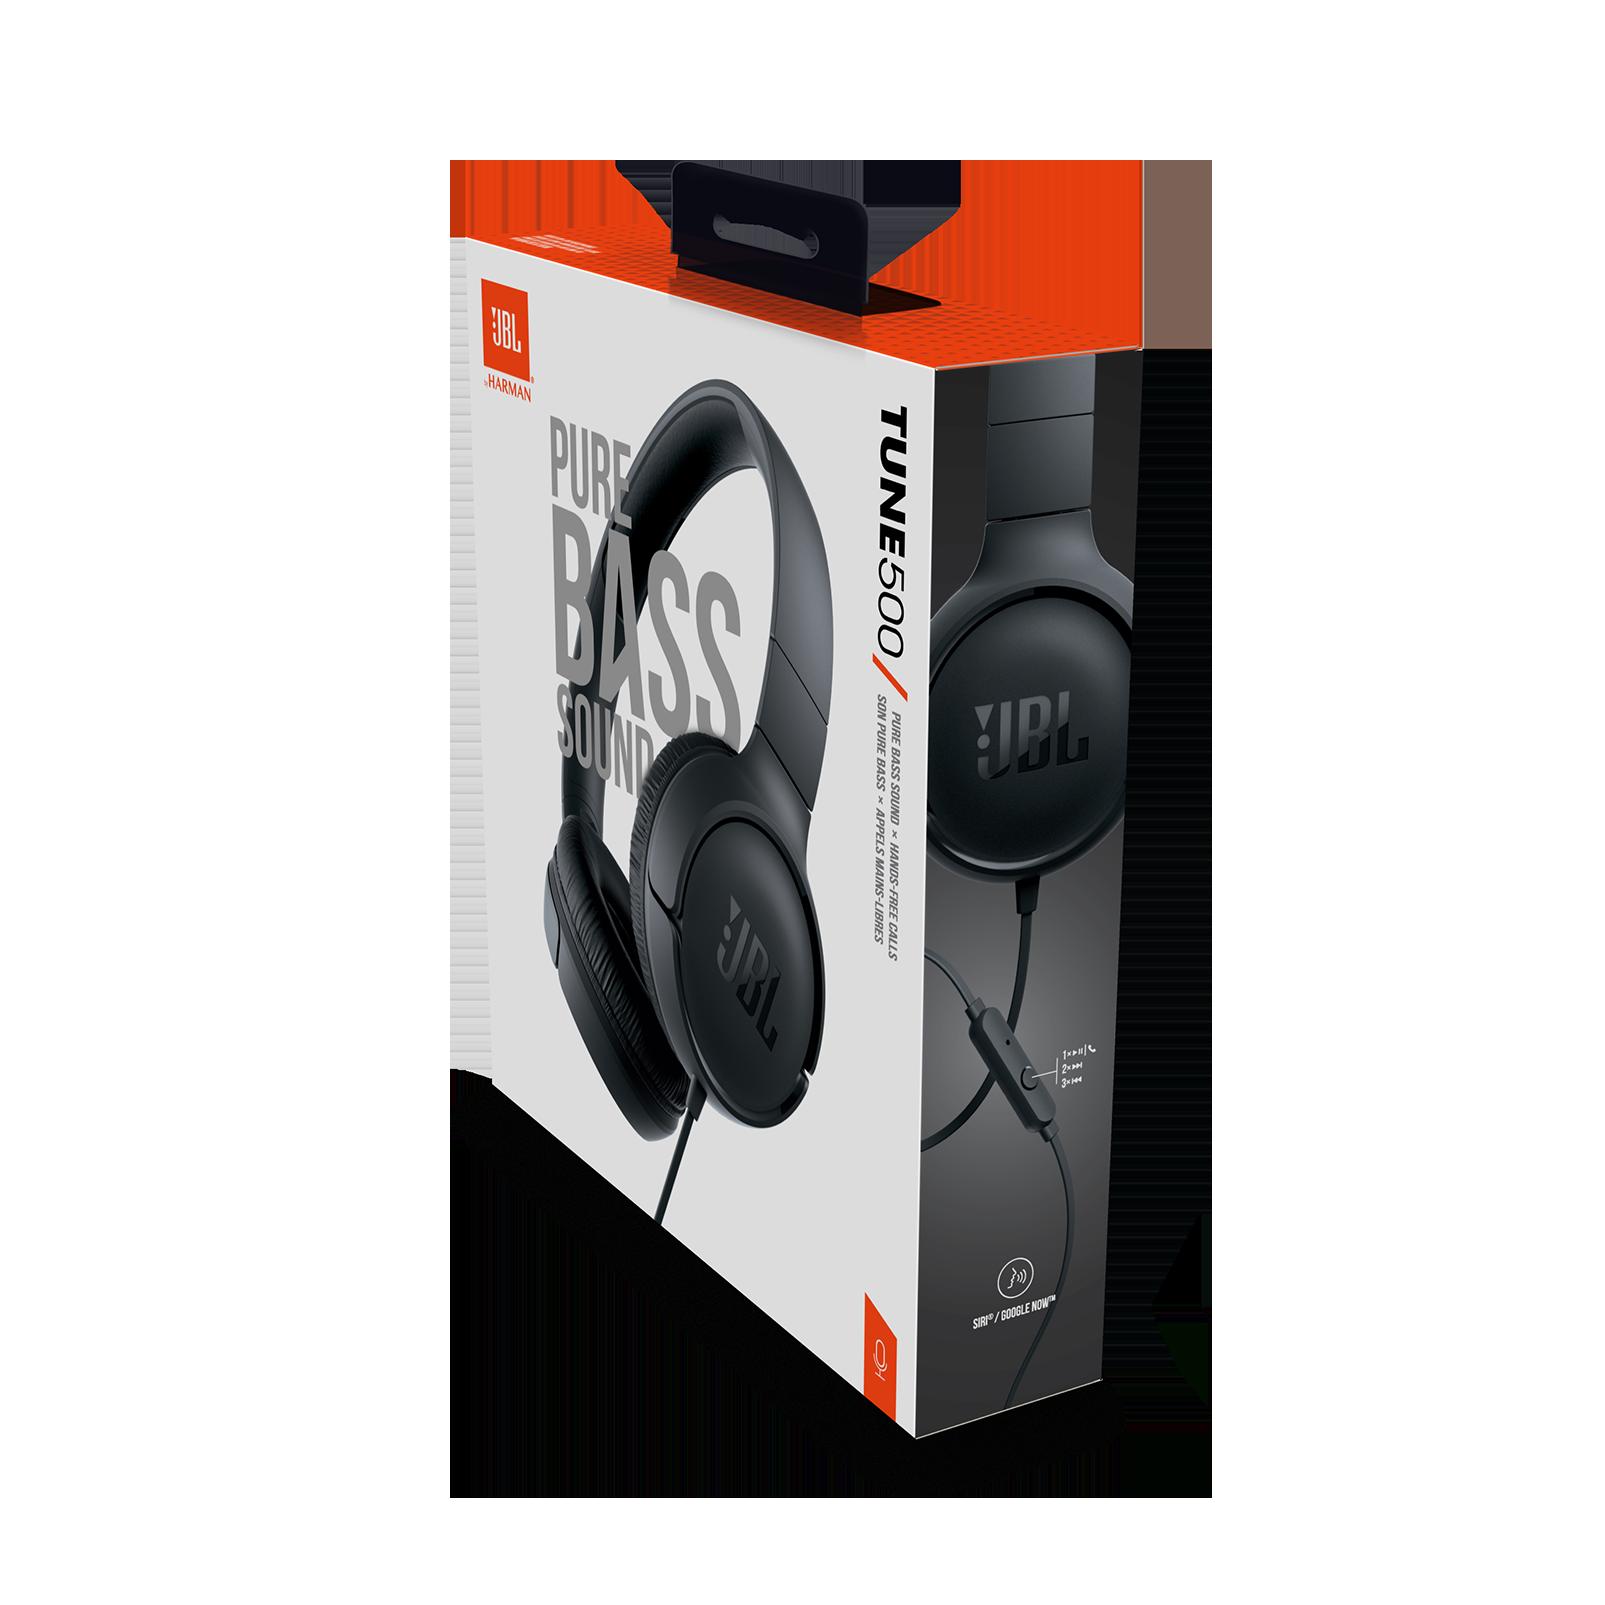 JBL TUNE 500 | Wired Headphones